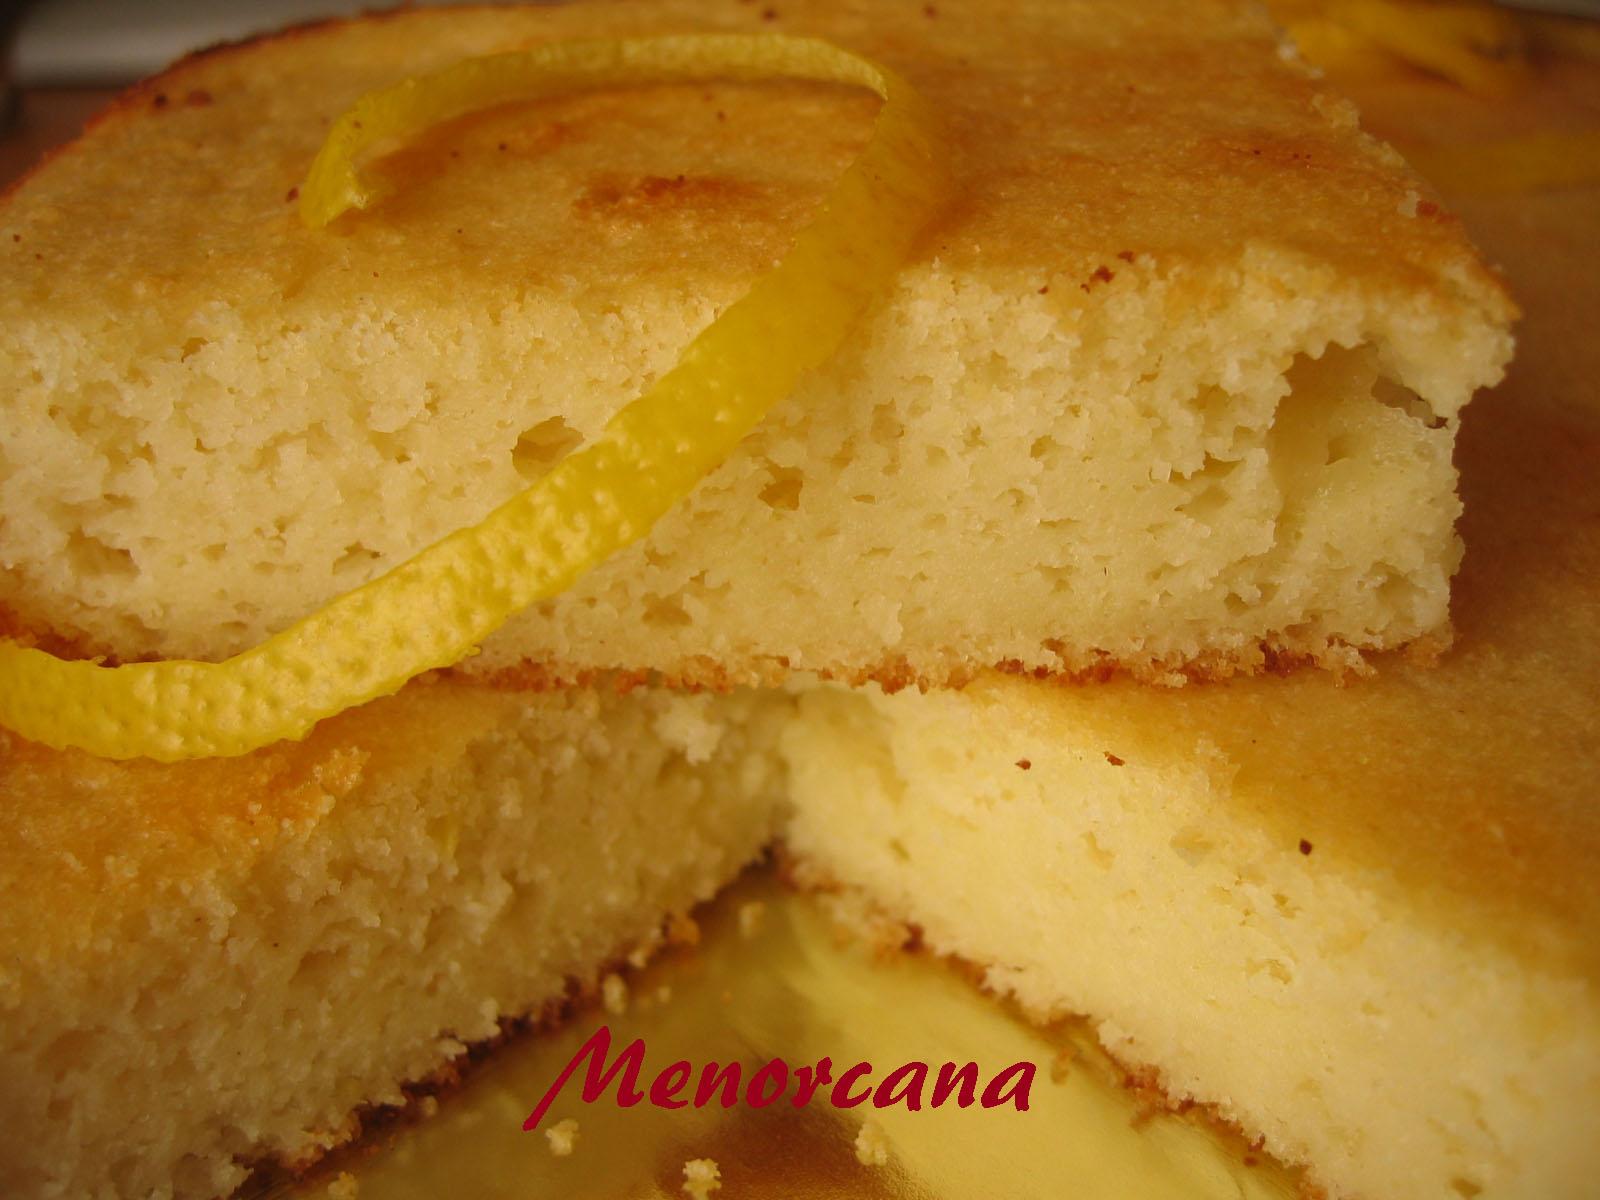 Tarta limon 020 copia ana en la cocina - Ana en la cocina ...